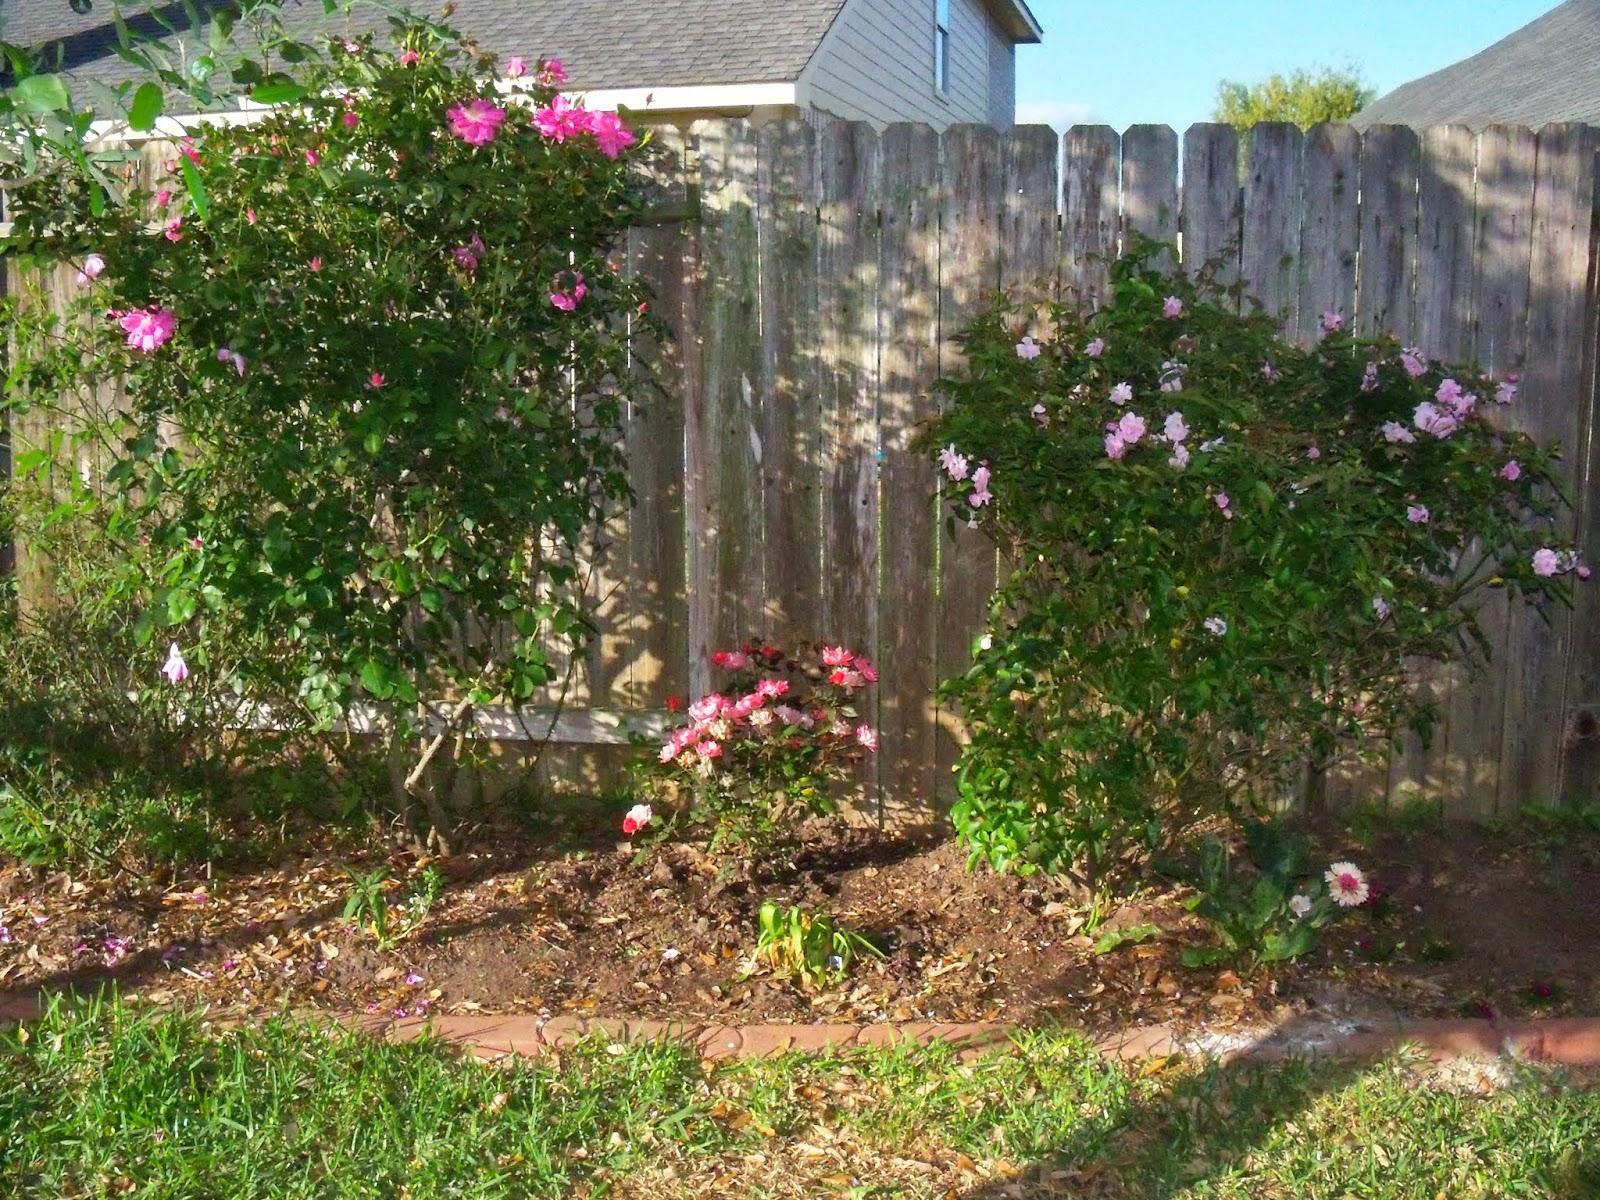 Gardening 2015 - 116_7628.JPG